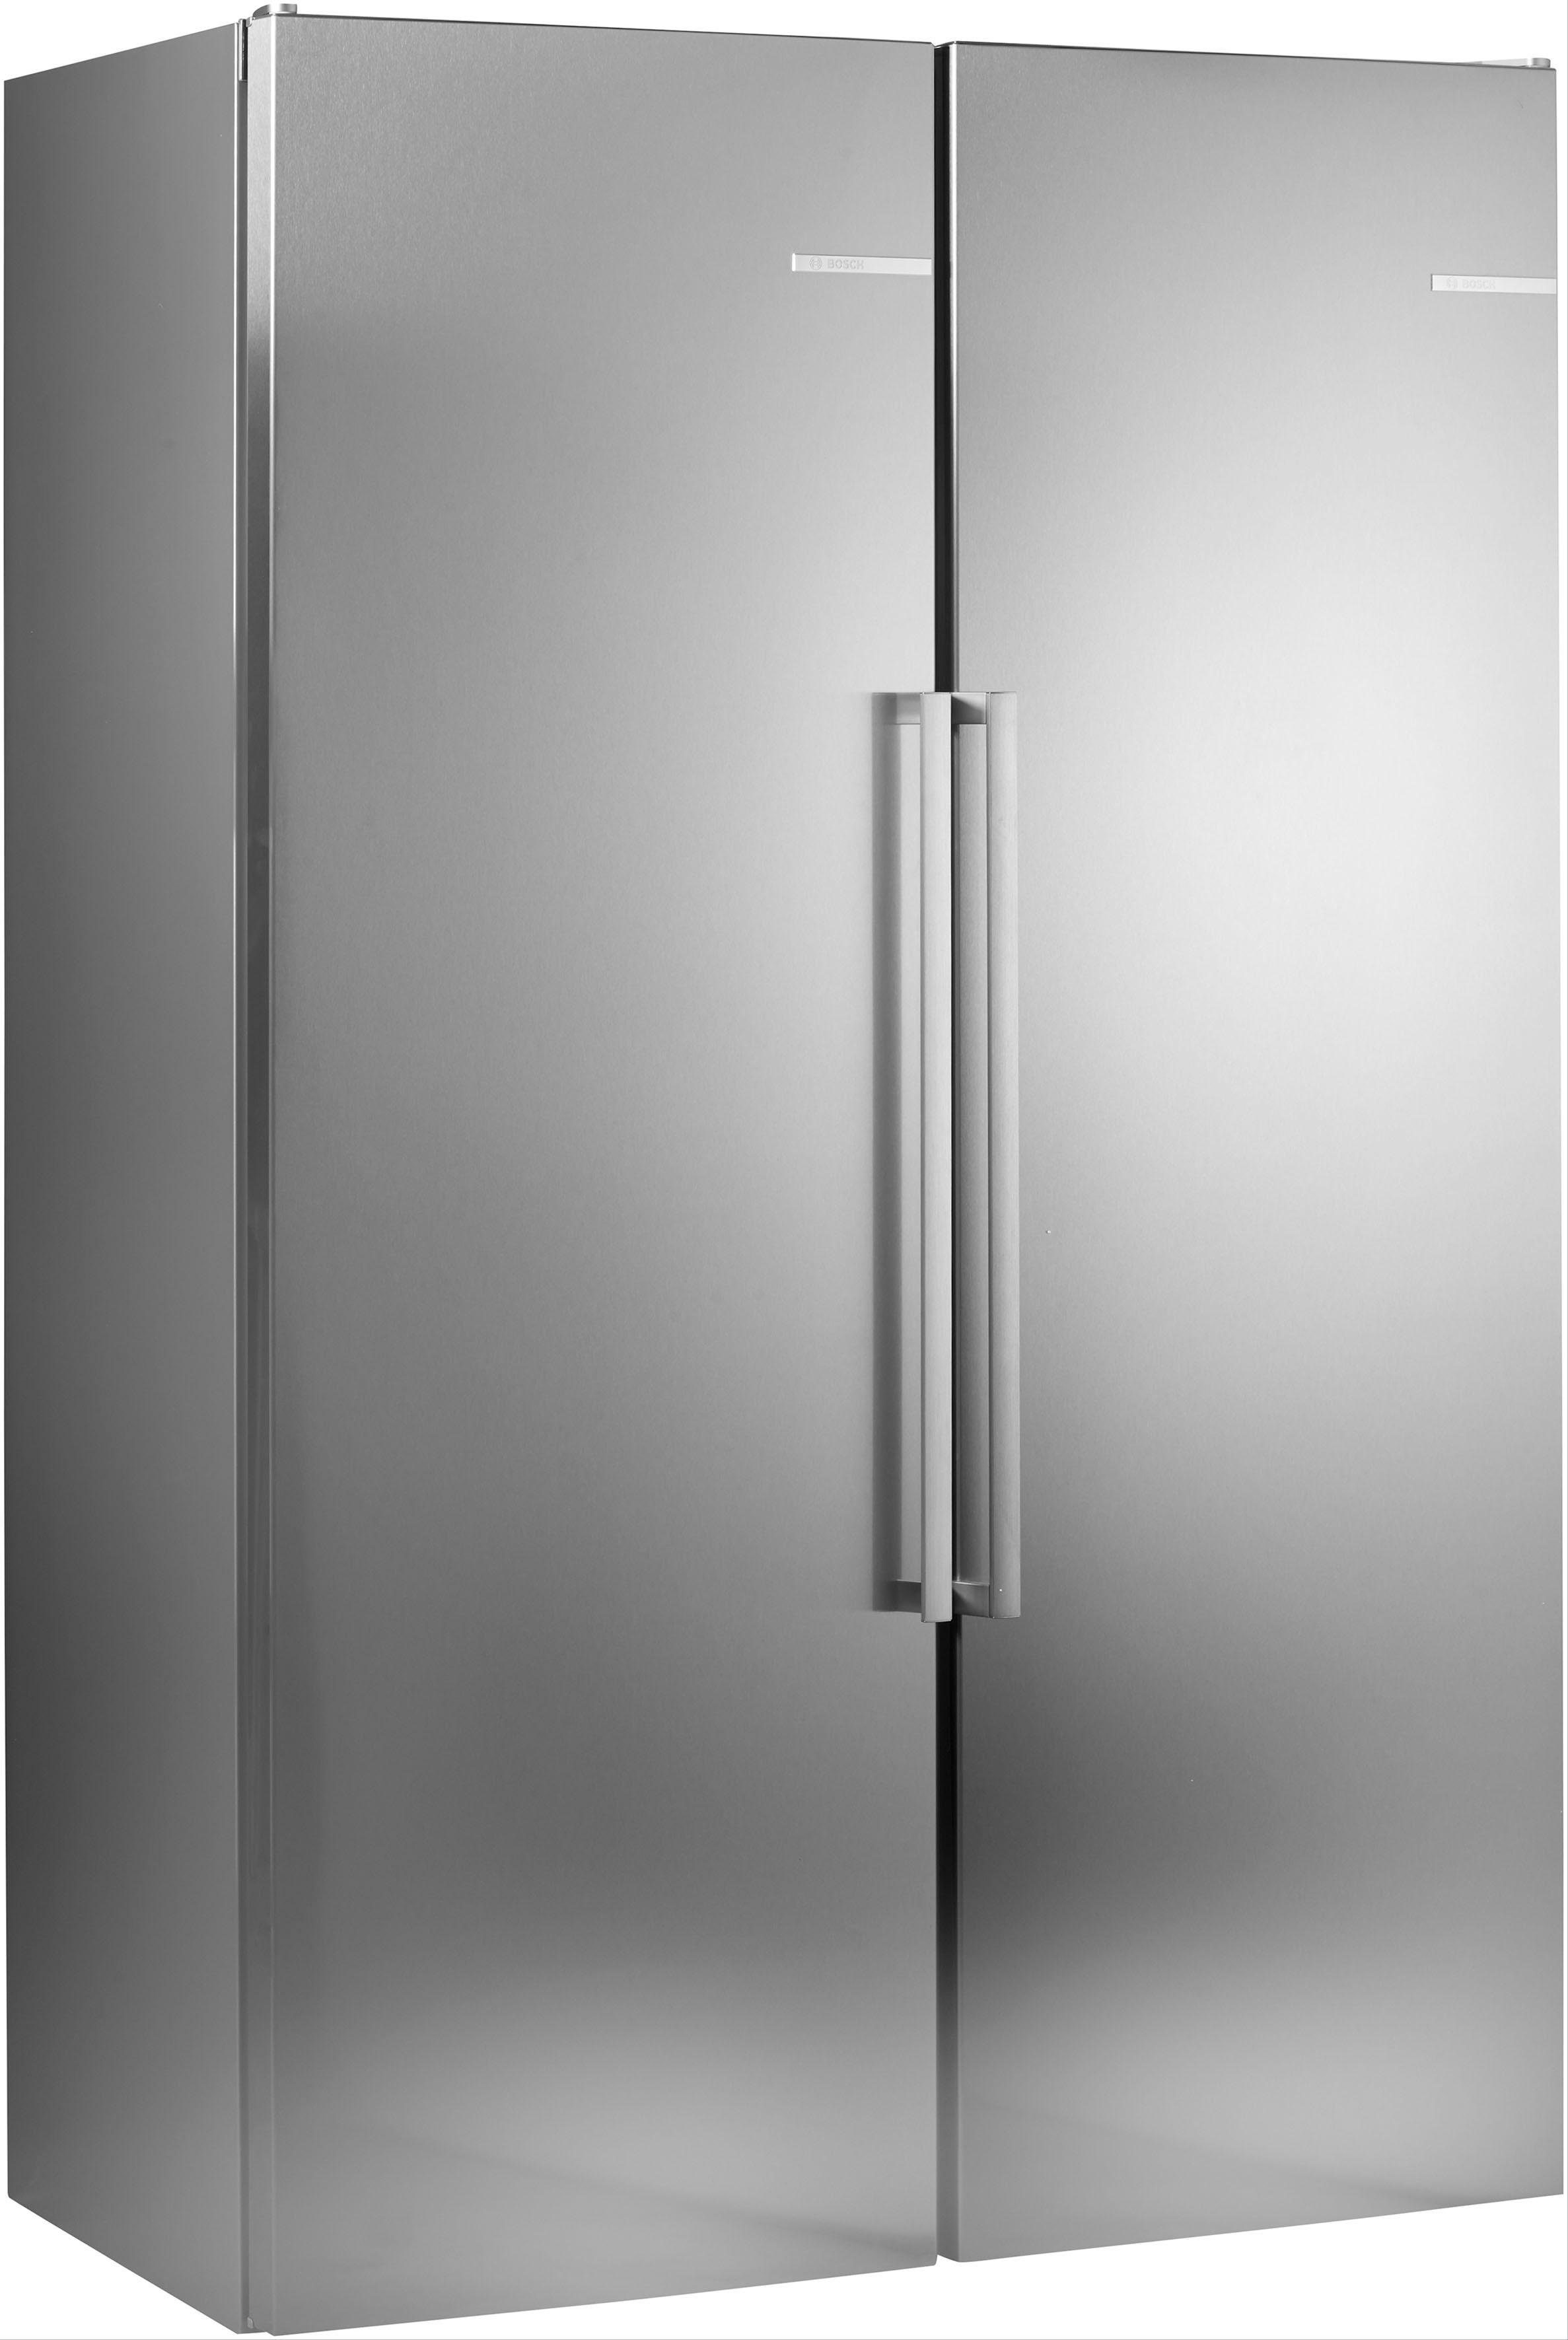 BOSCH Side-by-Side Serie 6 KAN95AI3P, 186 cm hoch, 120 cm breit